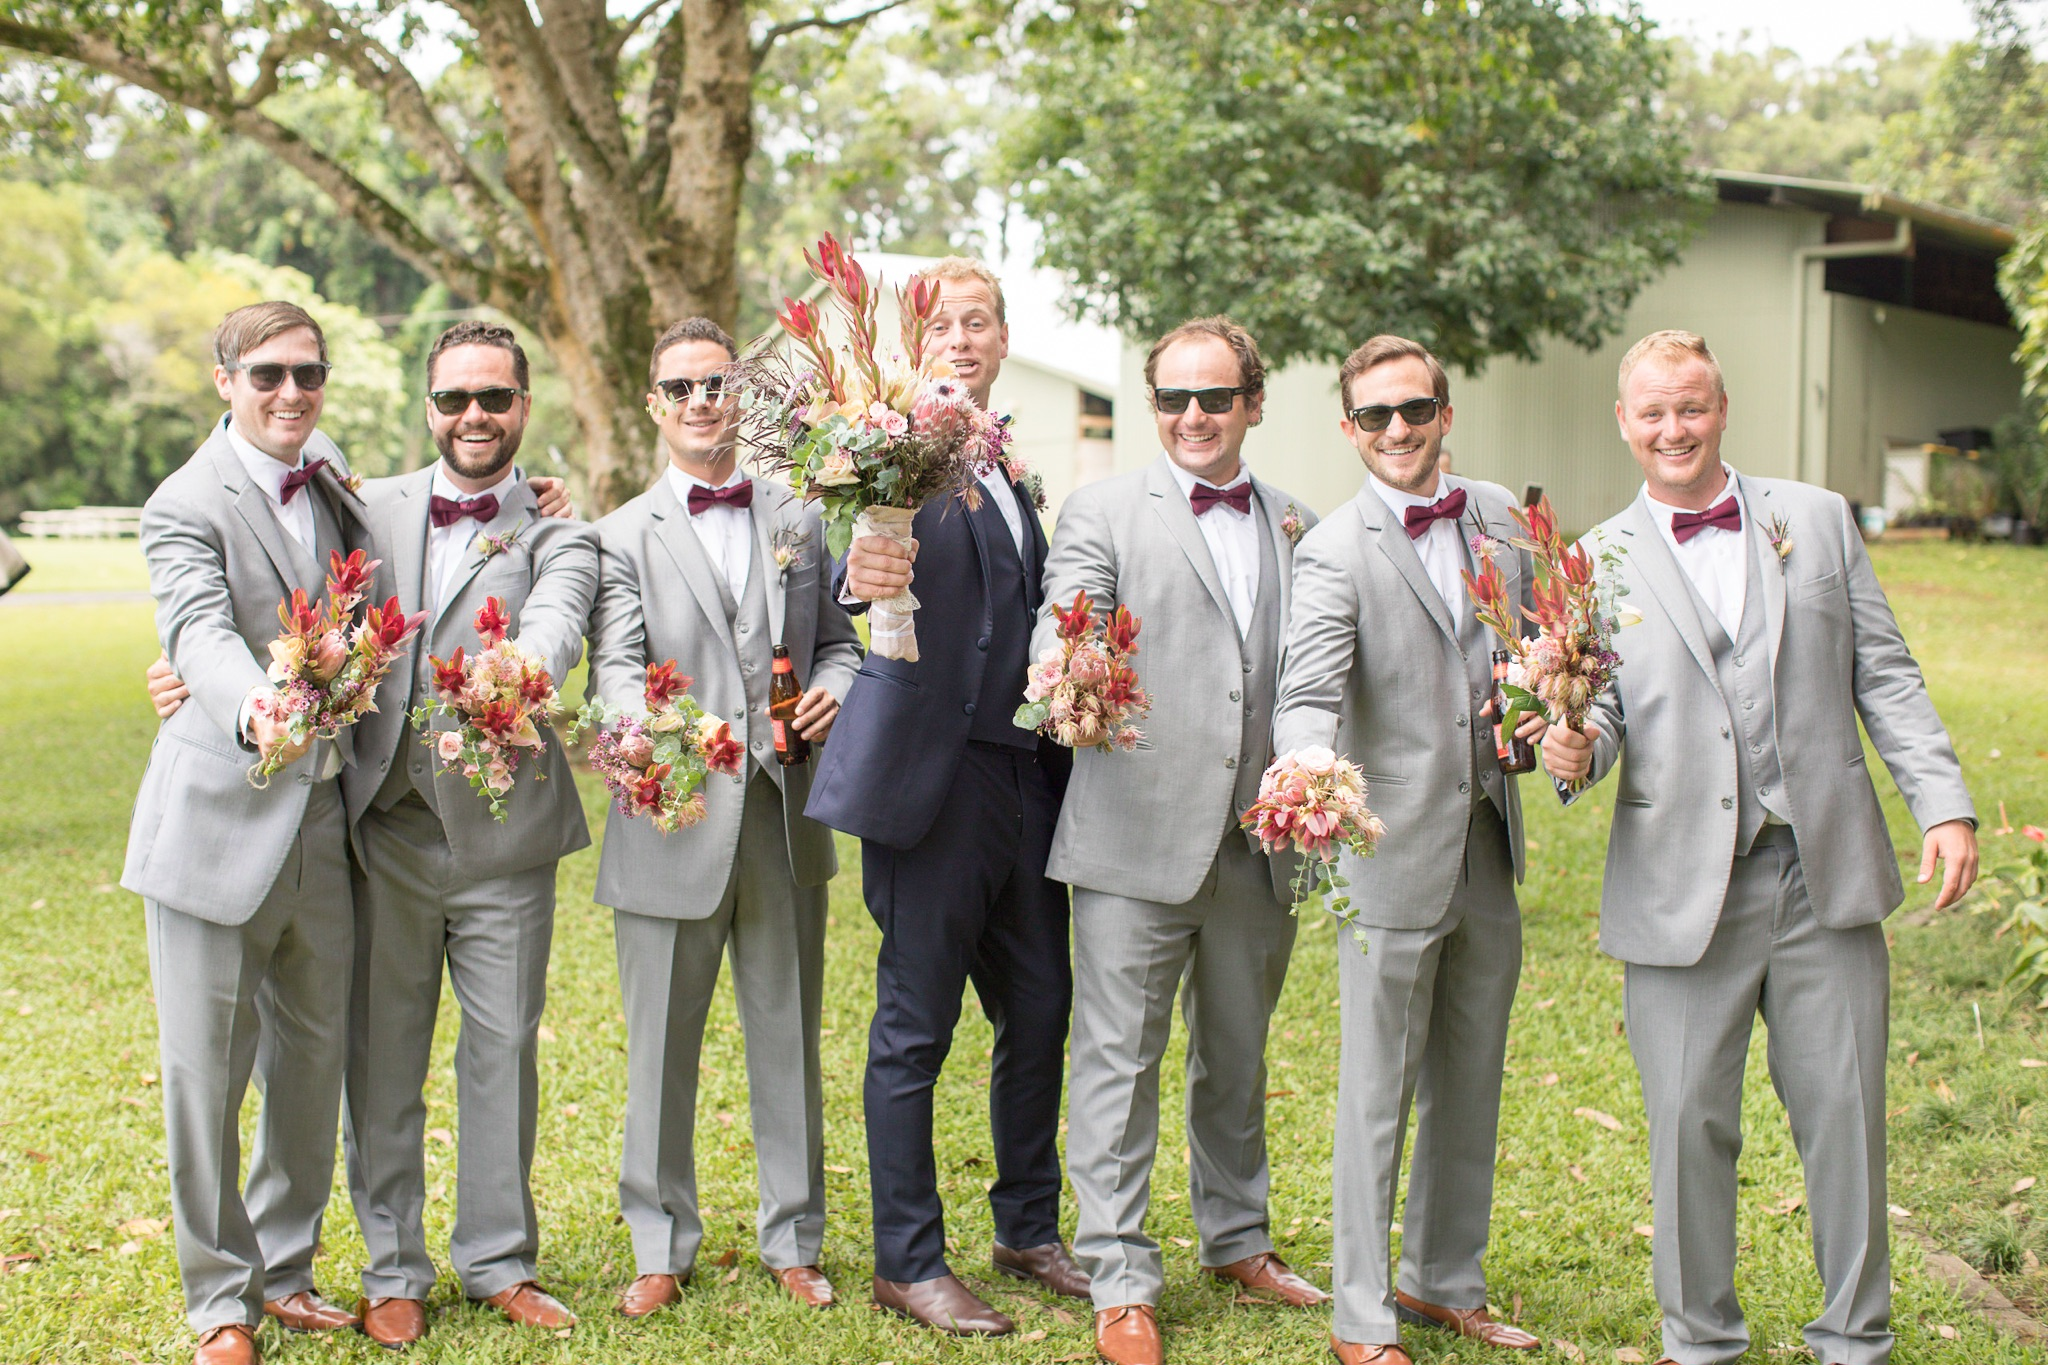 2018.09.05 Tessa's Wedding9.JPG